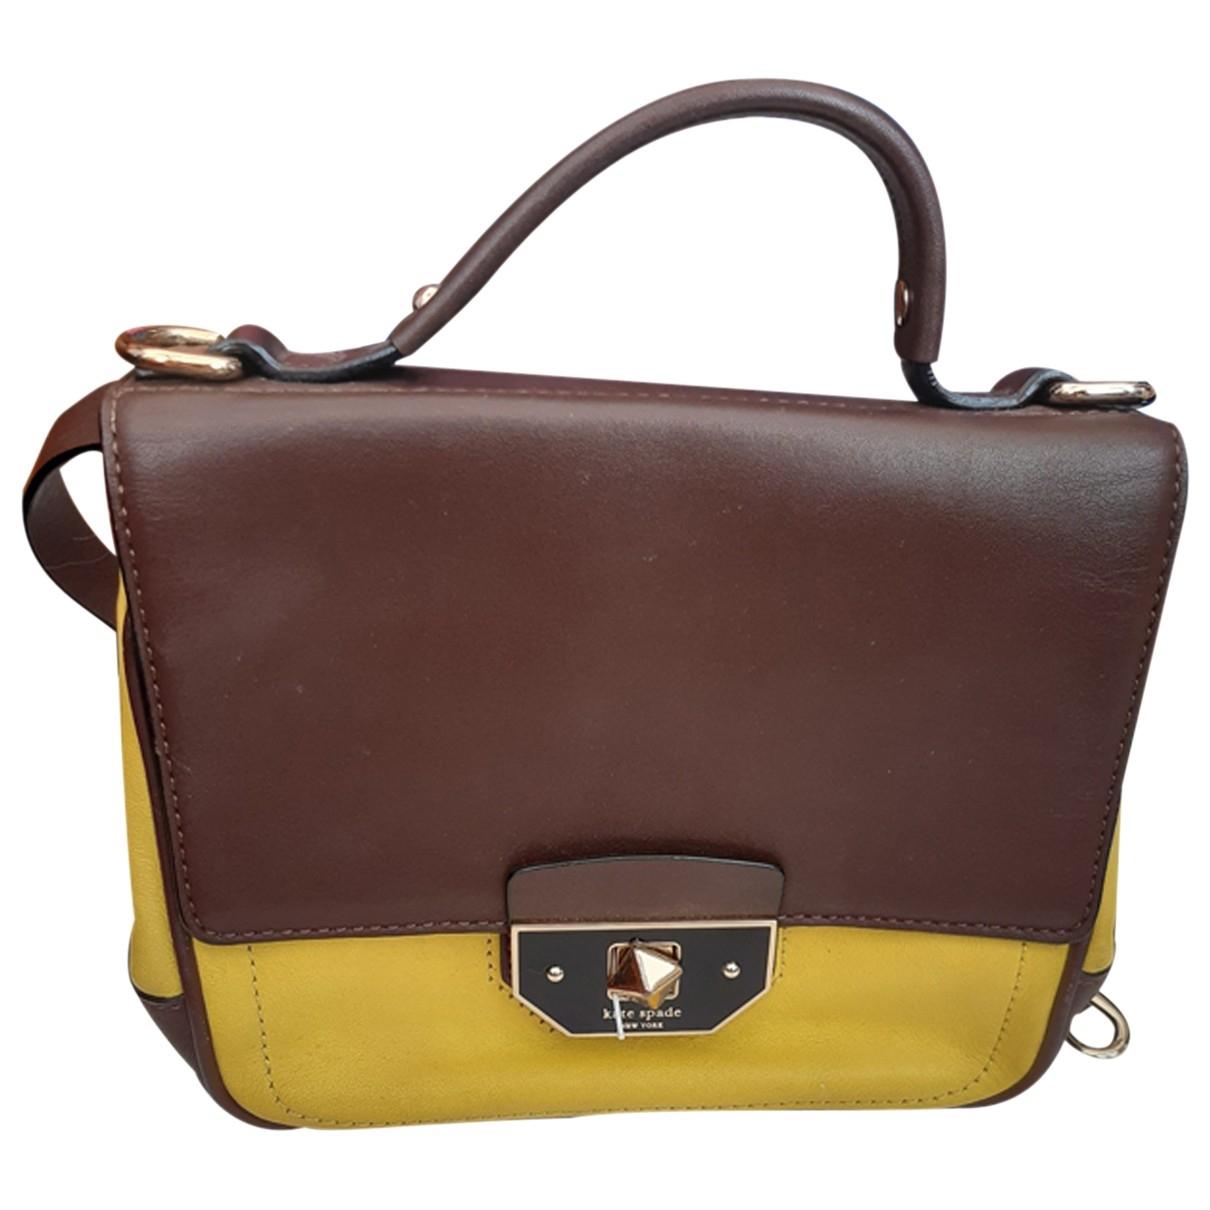 Kate Spade \N Leather handbag for Women \N